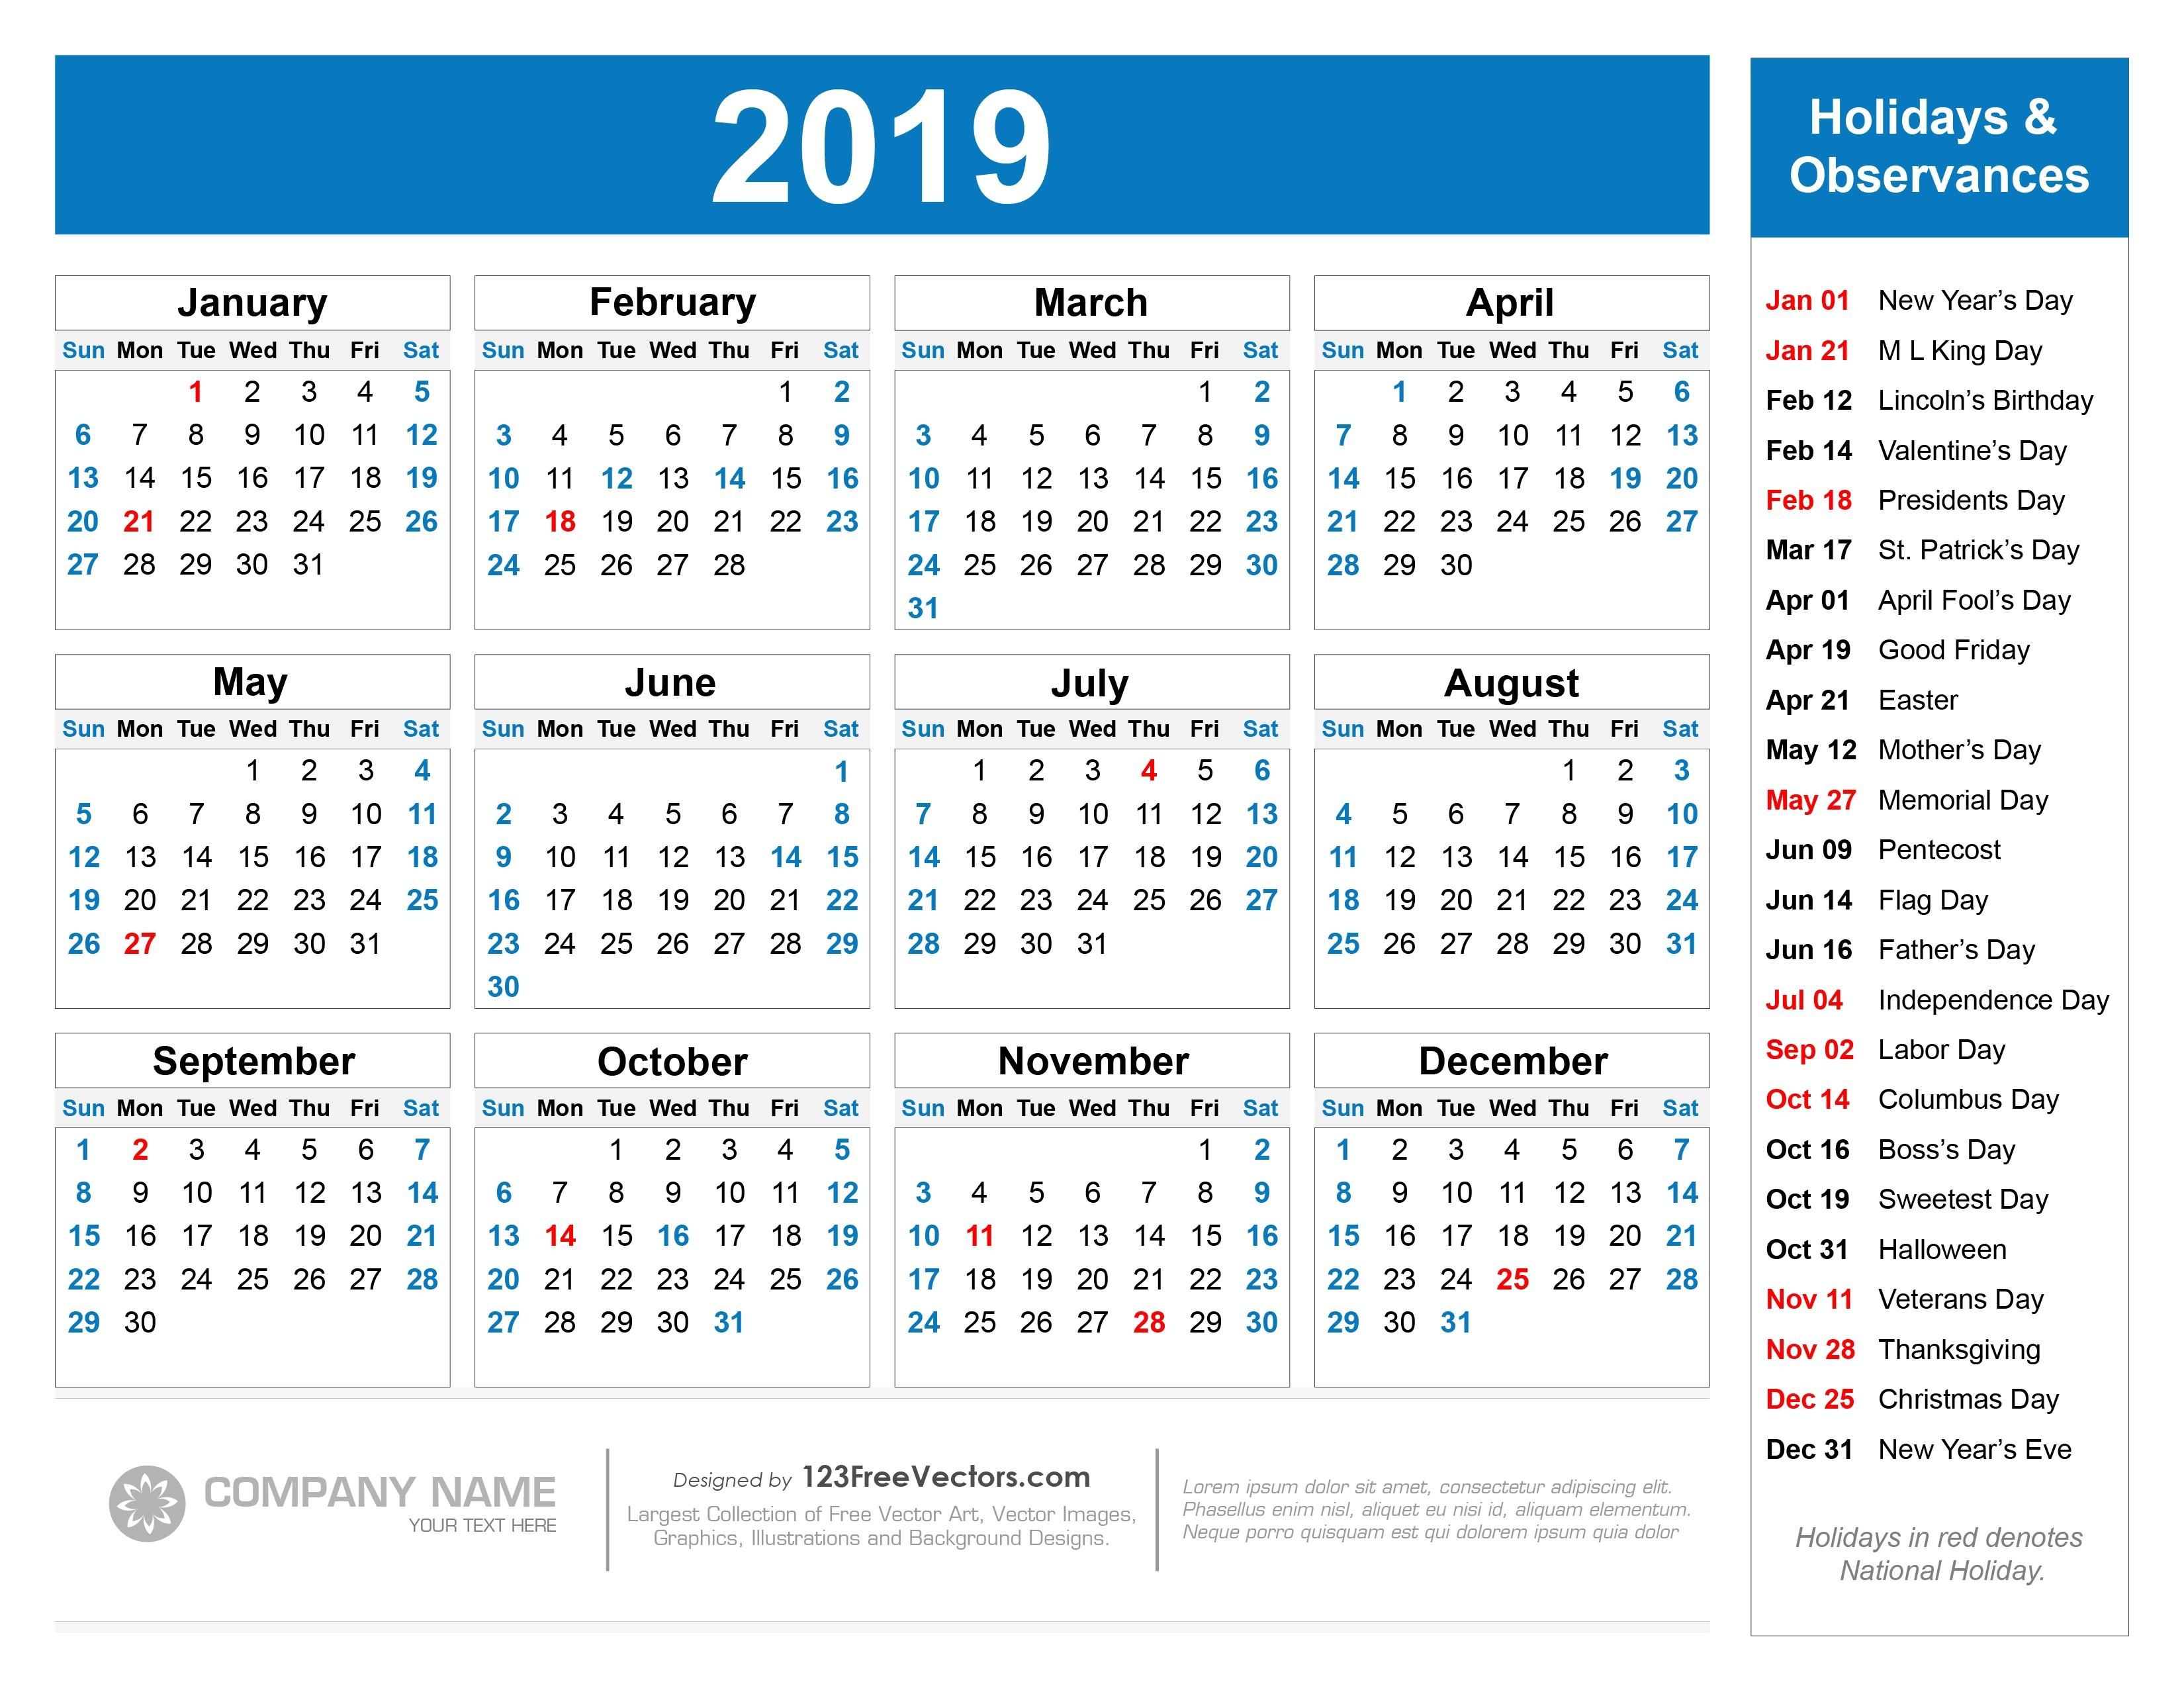 Free Printable 2019 Calendar with Holidays